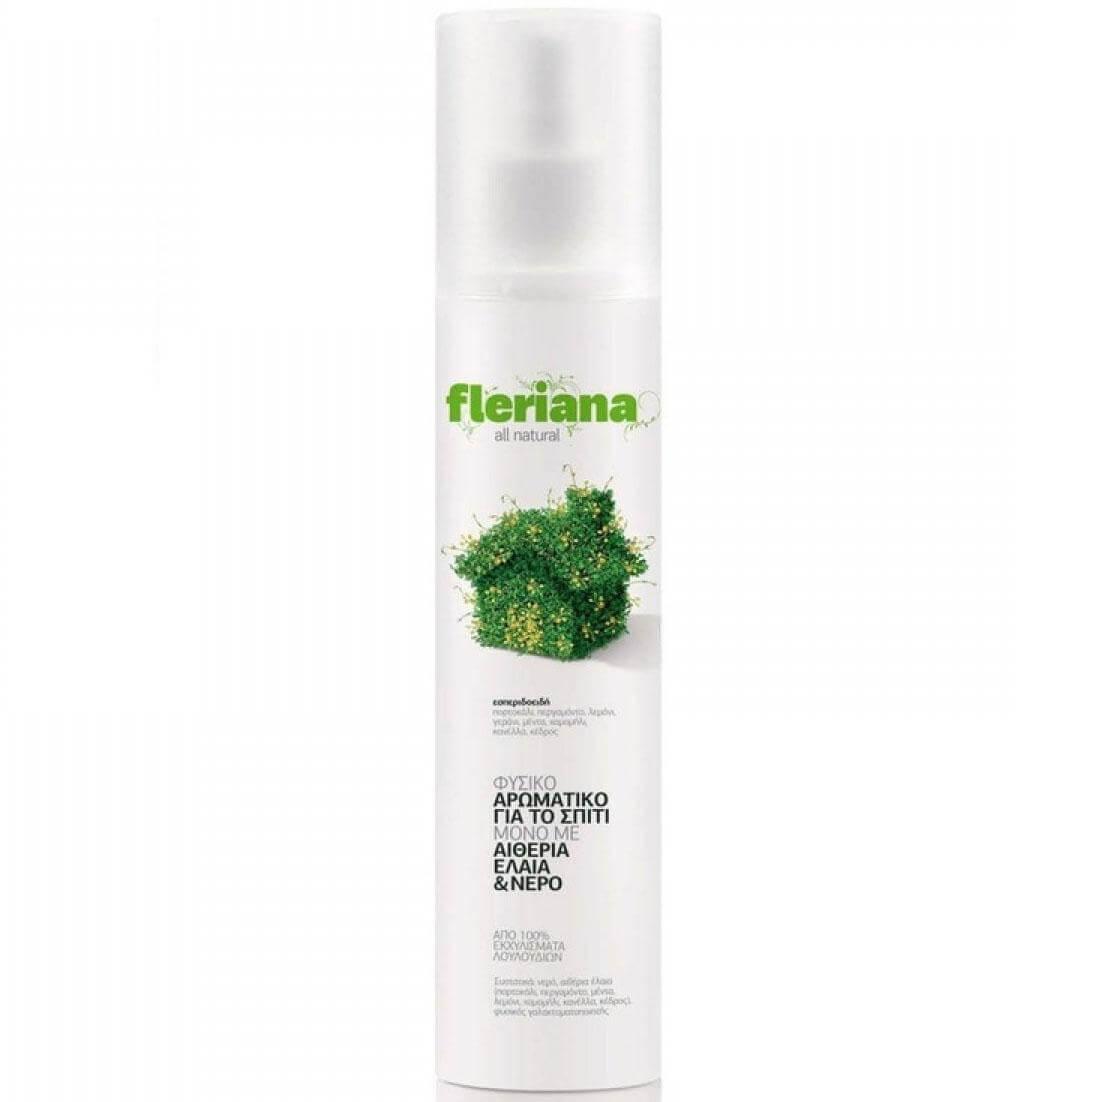 "Power Health Fleriana Φυσικό Αρωματικό Χώρου Με Άρωμα "" Εσπεριδοειδή "" 250ml"